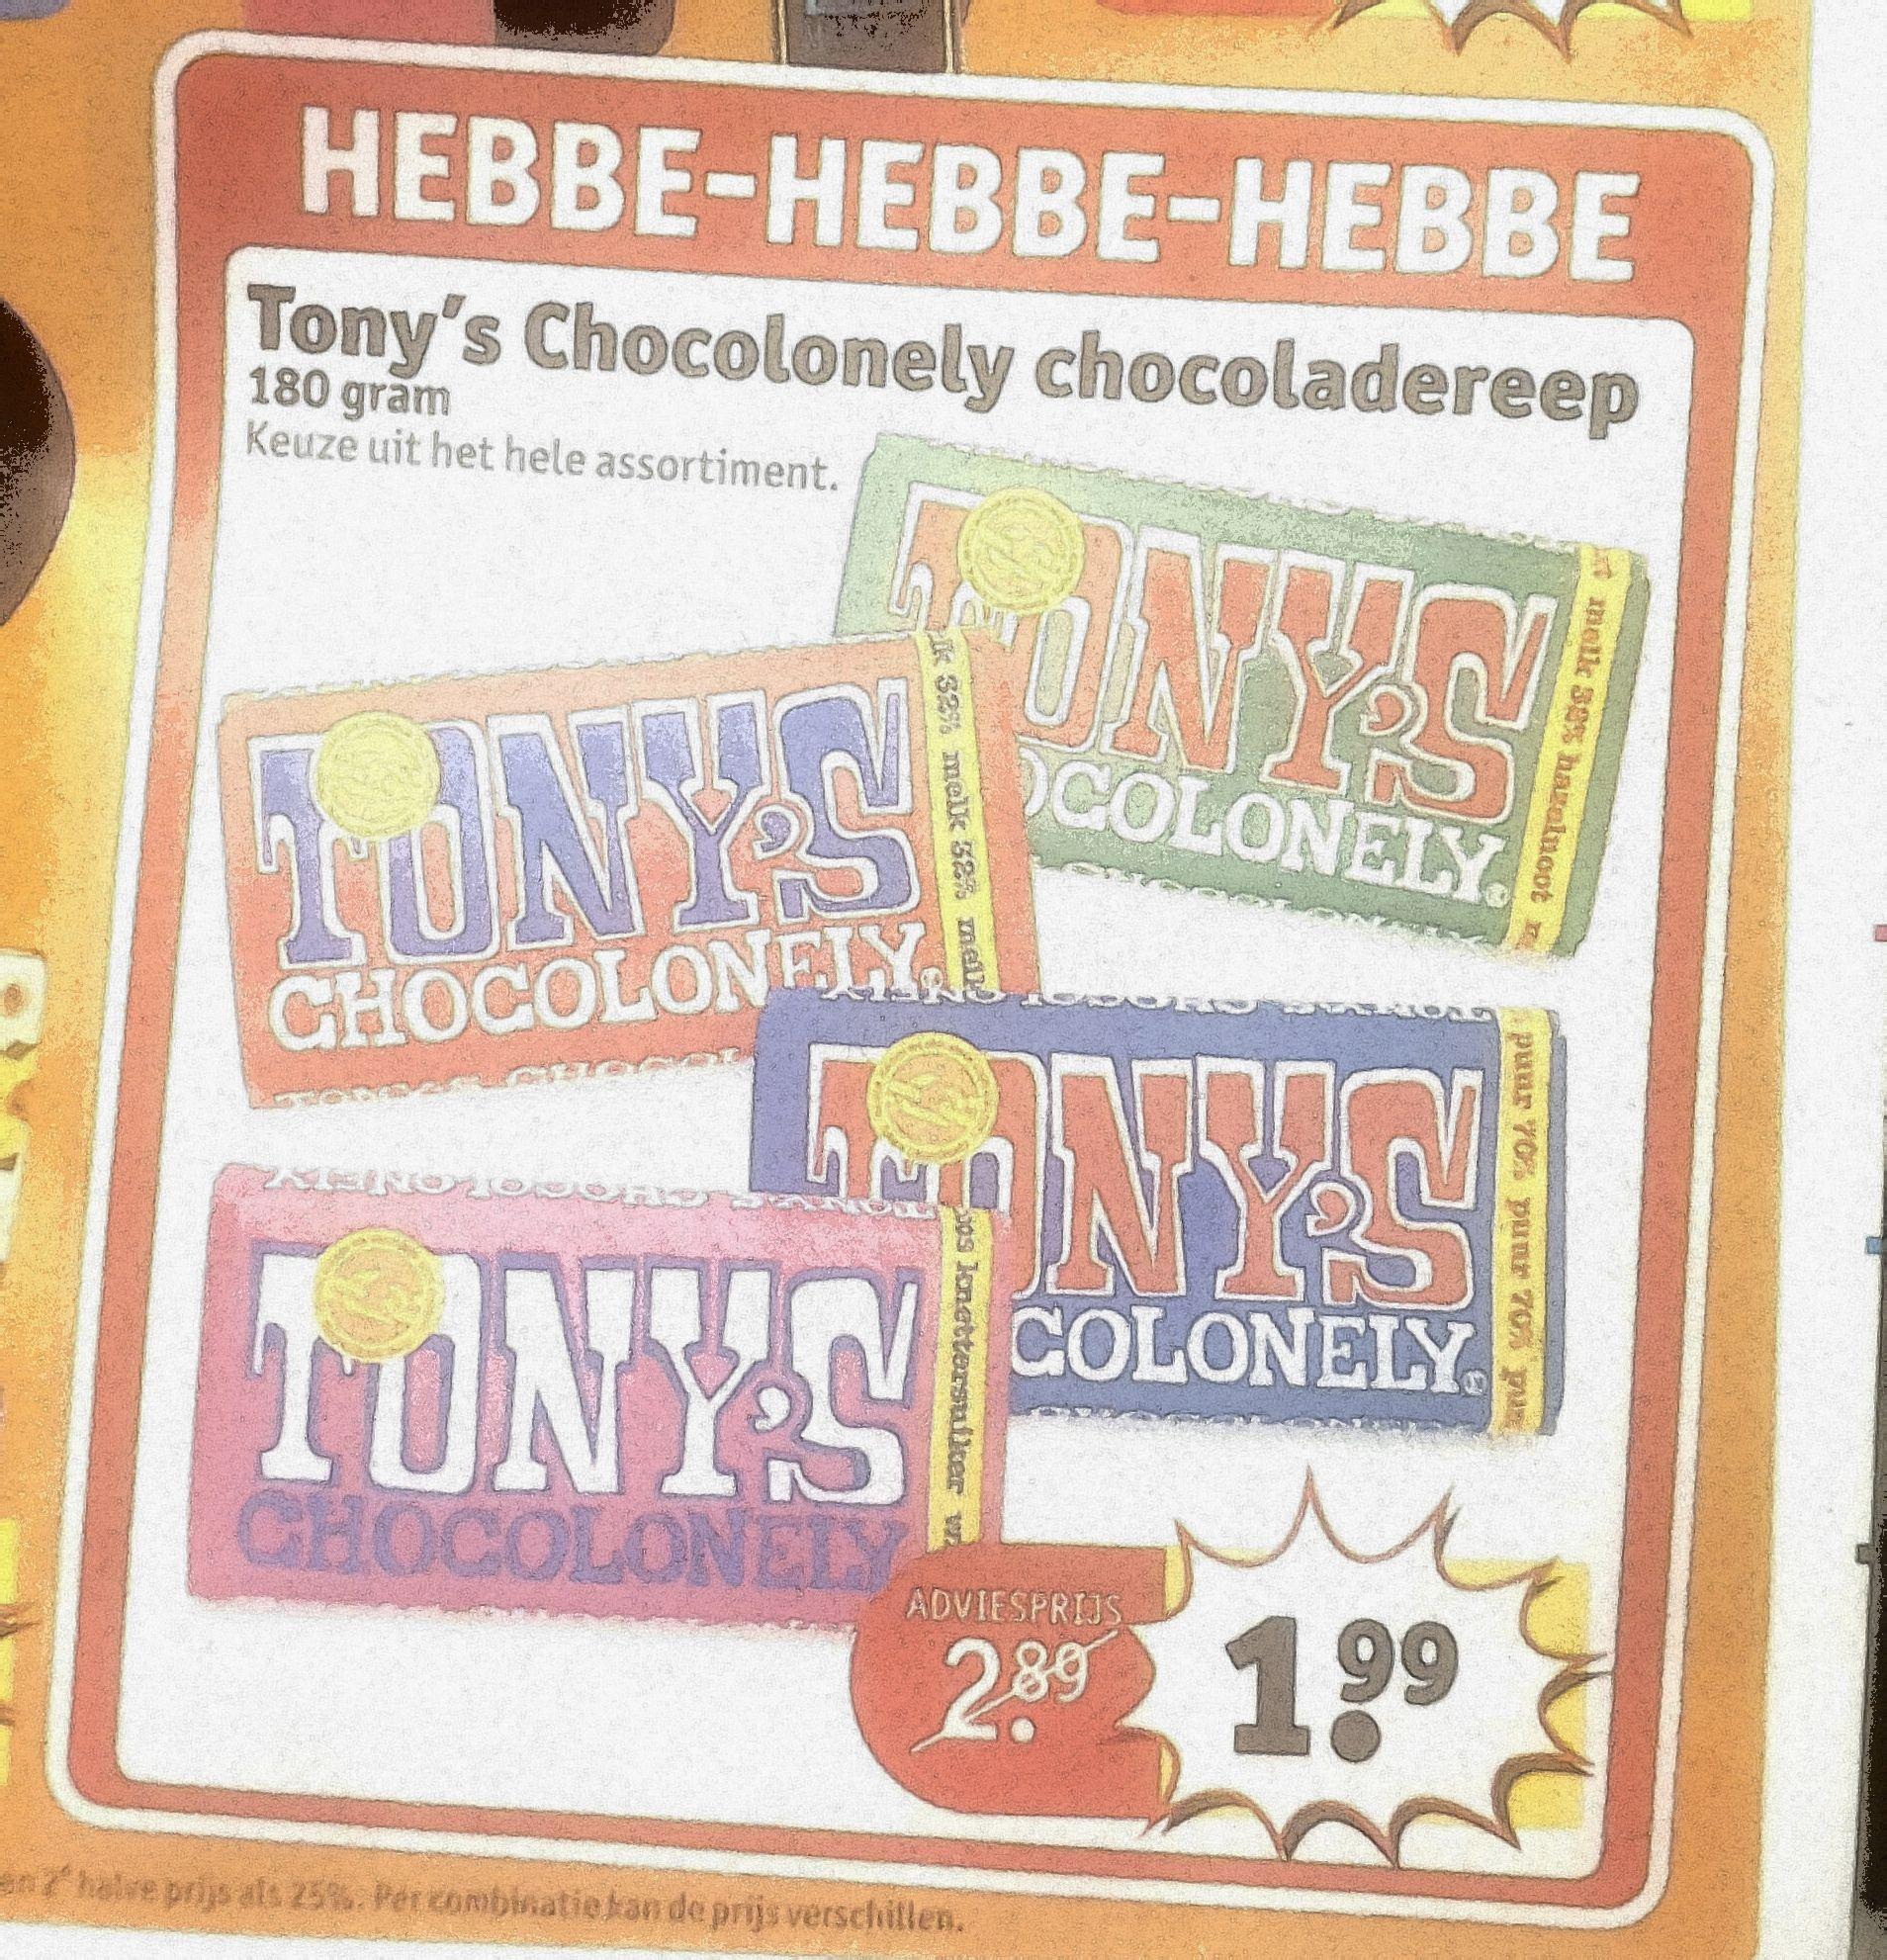 Tony's Chocolonely 180 gram €1,99 @Kruidvat